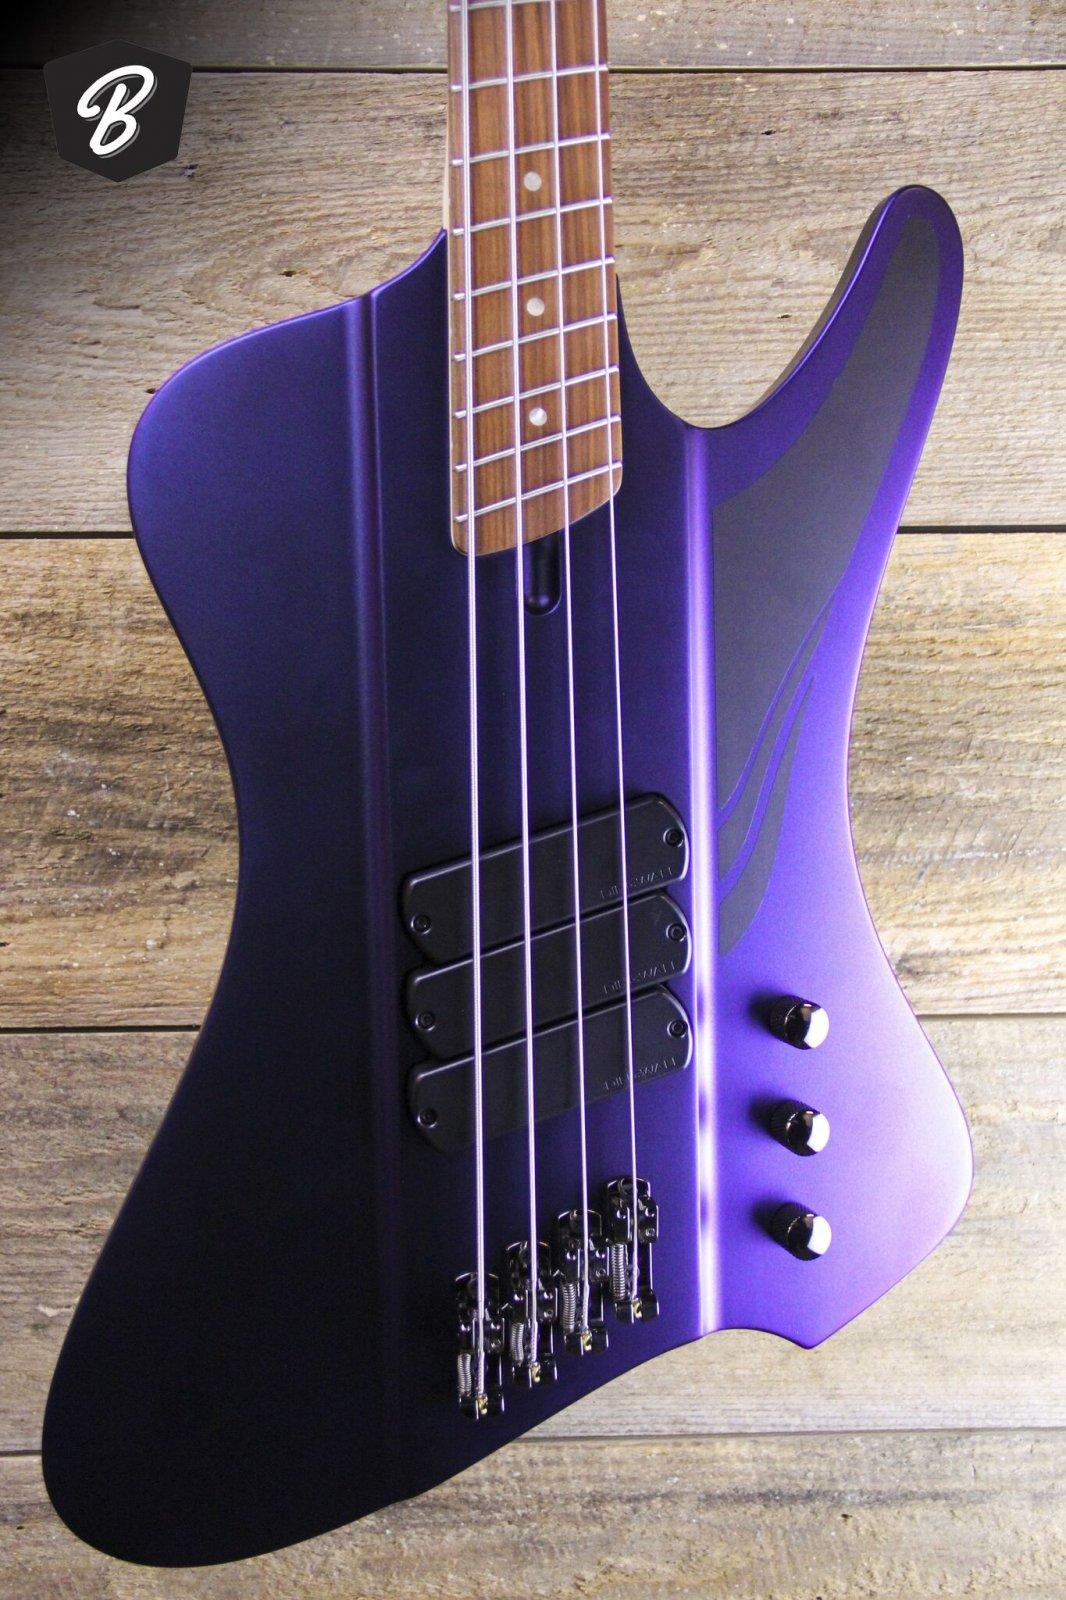 Dingwall D-Roc Standard  in Matte Blue to Purple Colorshift Finish